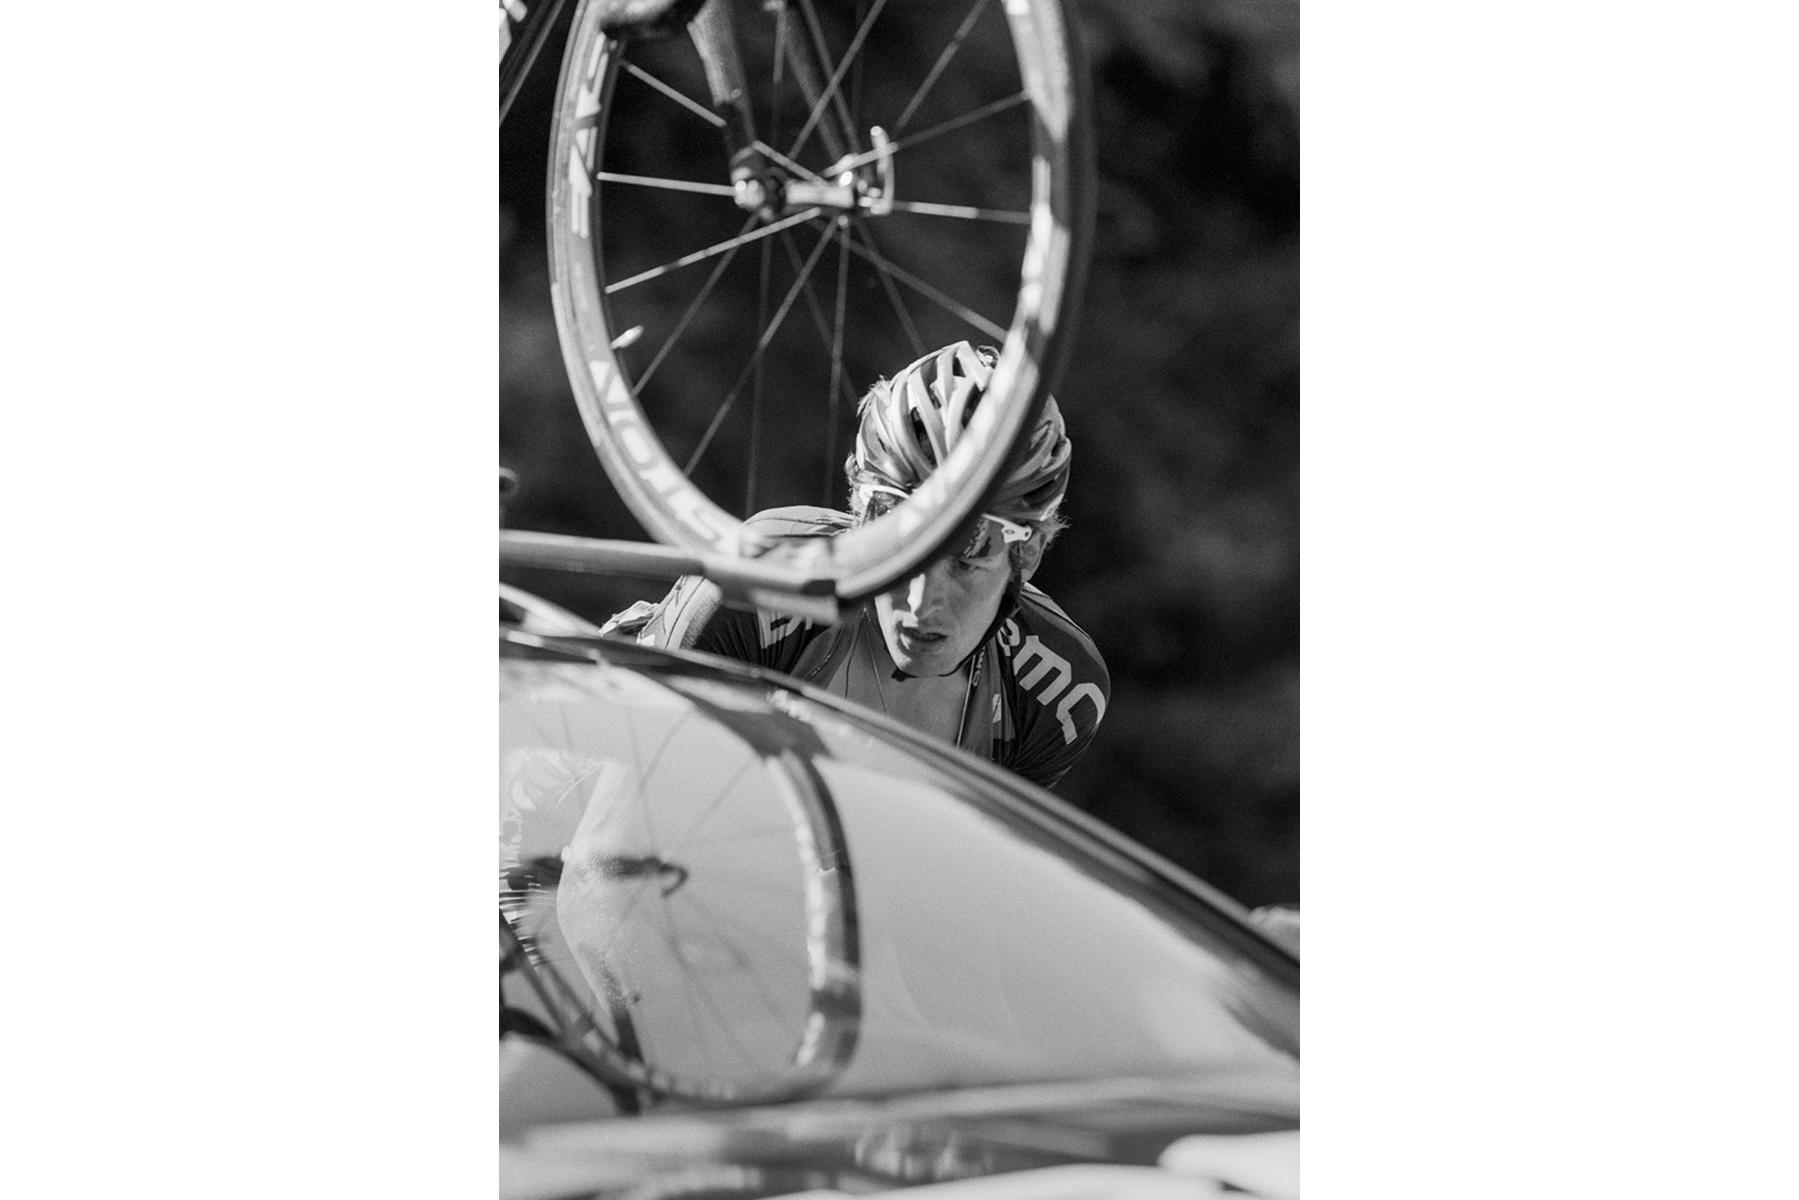 Le Tour de France 2011 Marcus Burghardt, a German cyclist for team BMC Racing Team, getting instructions from the team car. Marcus Burghardt, cycliste allemand de l'équipe BMC Racing Team, recevant des instructions de la voiture de l'équipe. Marcus Burghardt, deutscher Rennfahrer für das BMC Racing Team, im Gespräch mit dem Teamwagen. Marcus Burghardt, ciclista alemán del equipo BMC Racing Team recibe instrucciones del coche de apoyo.